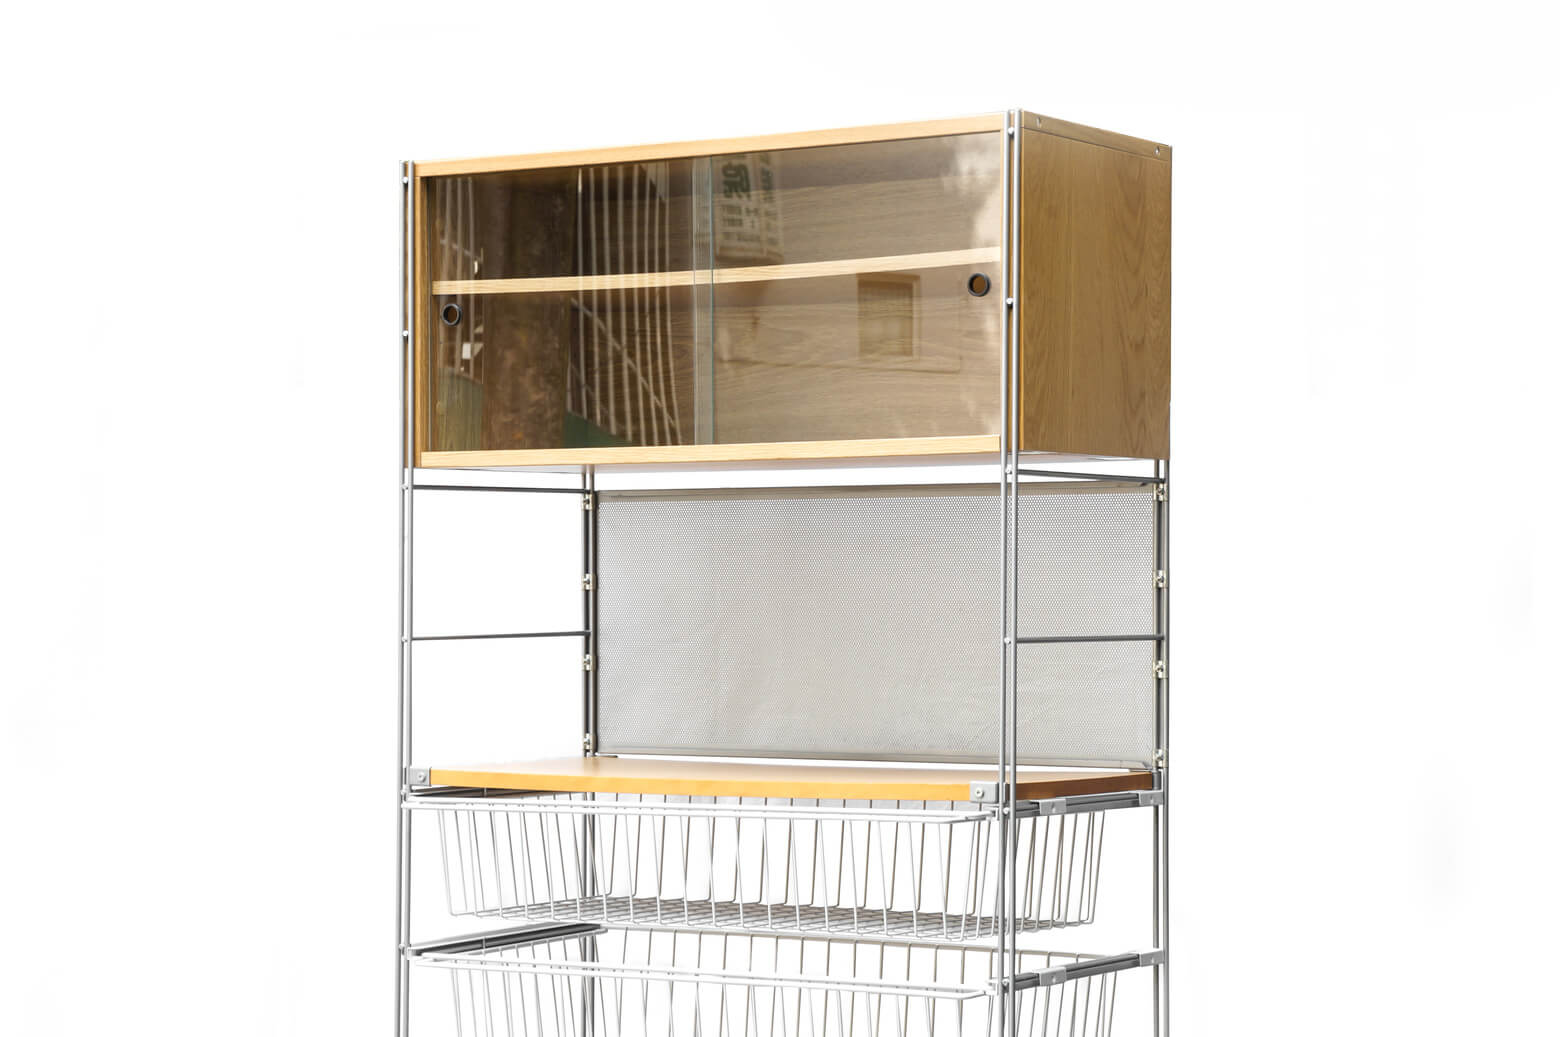 MUJI Steel Unit Shelf/無印良品 スチール ユニットシェルフ 食器棚 オーク材